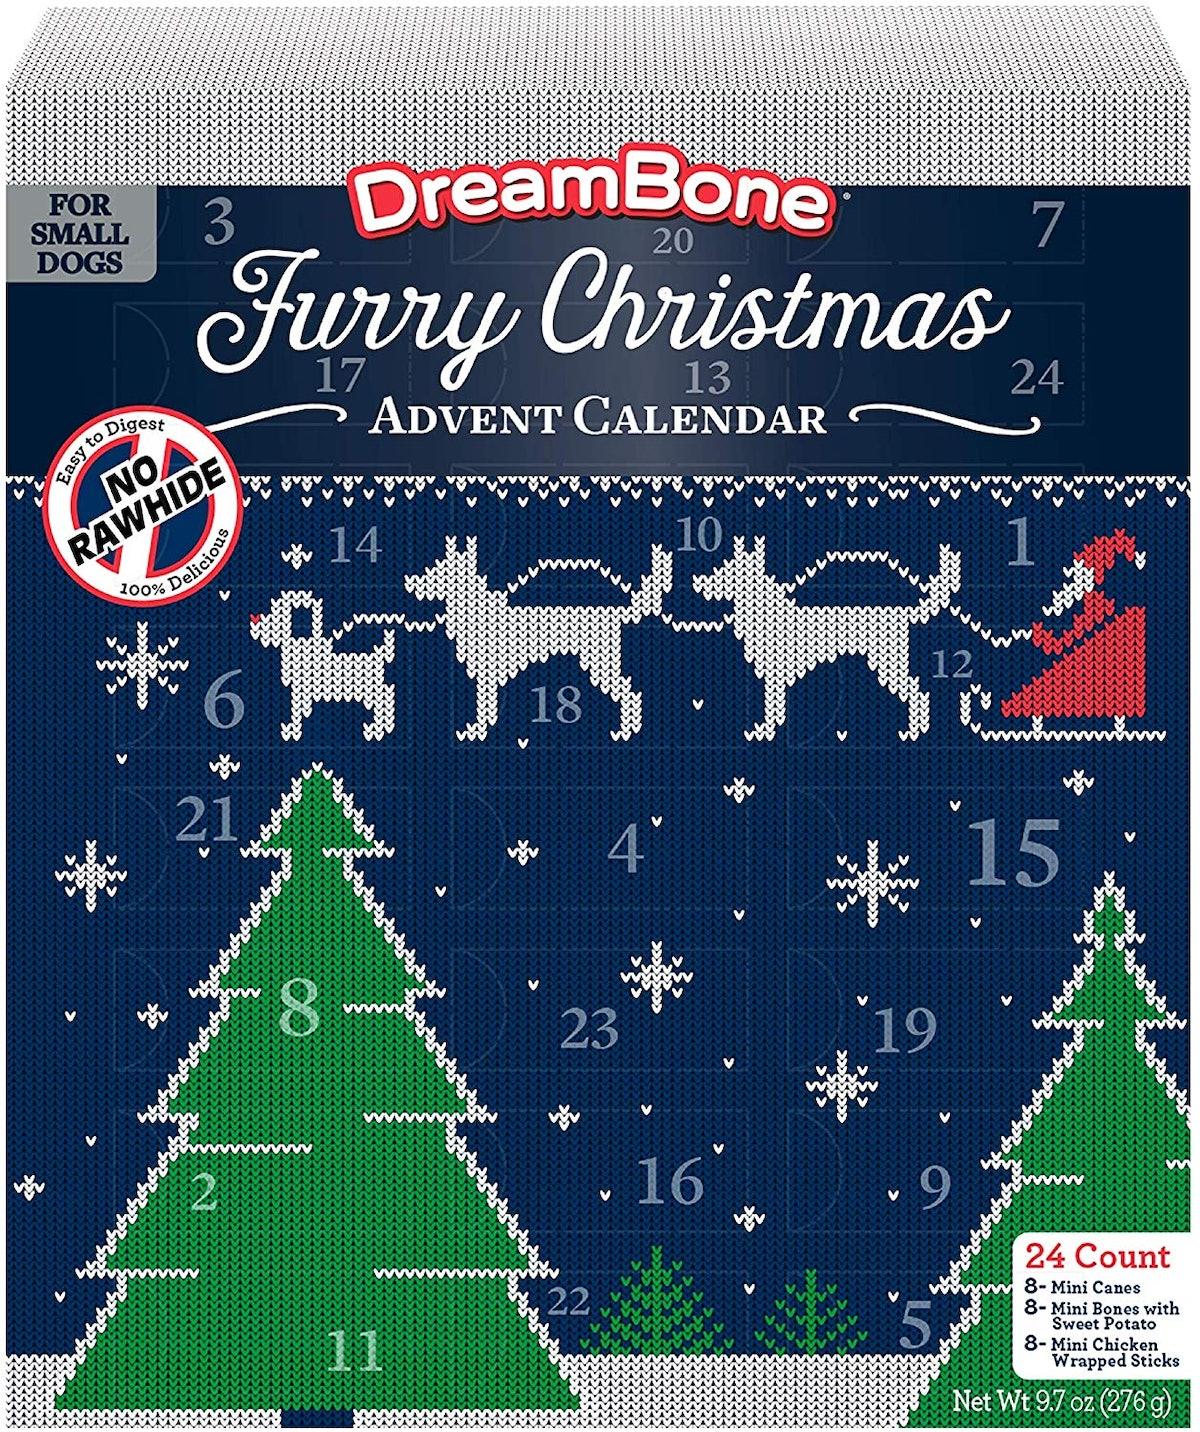 DreamBone Rawhide-Free Dog Chews Advent Calendar